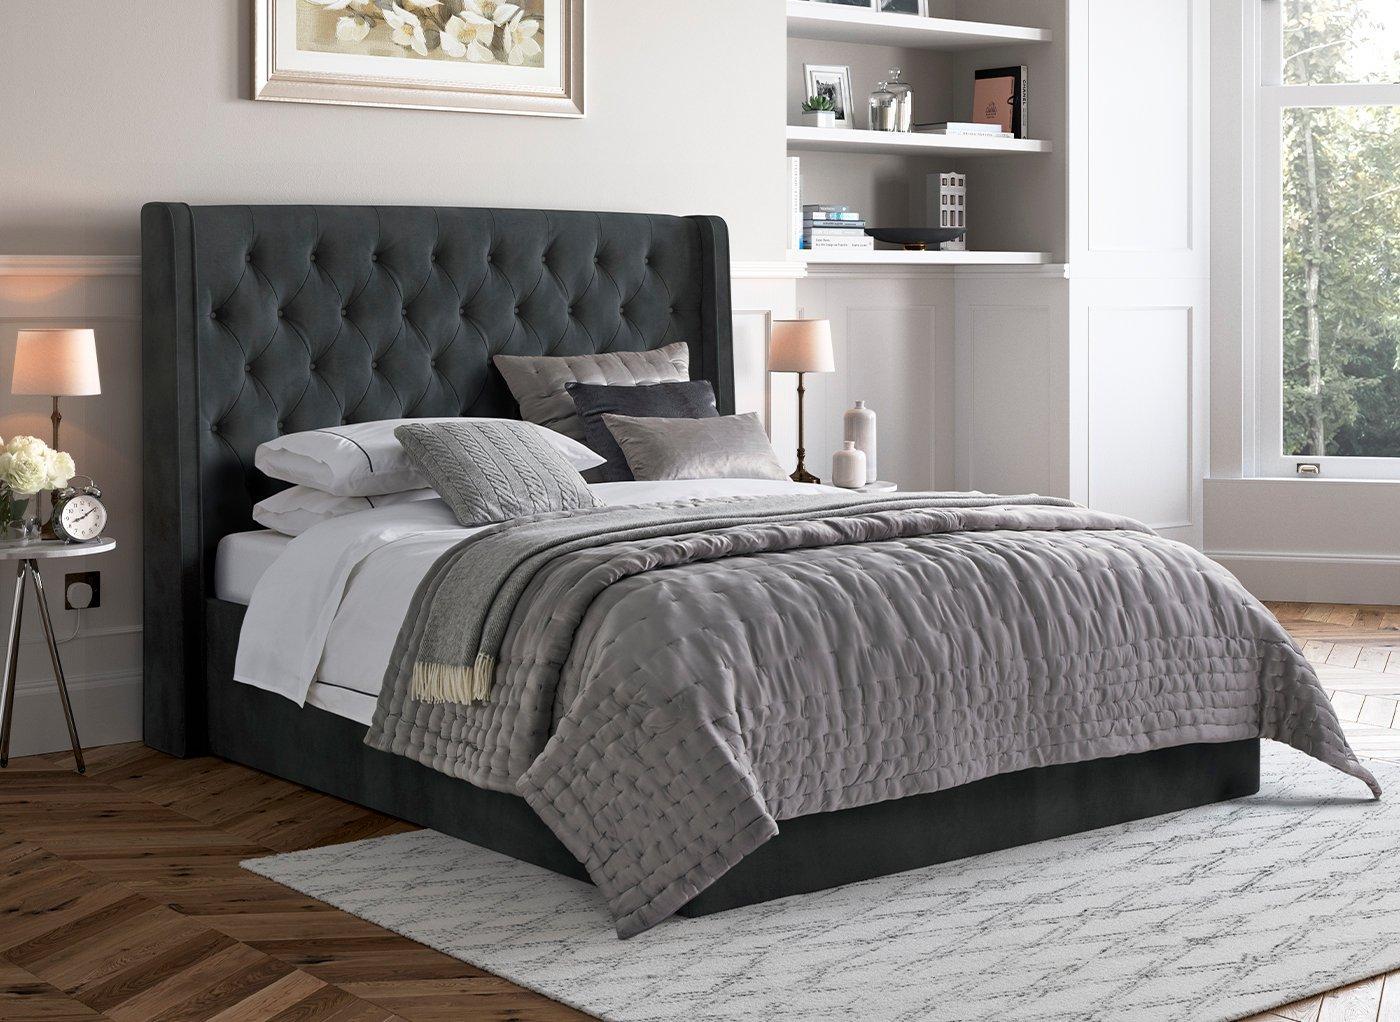 black-bed-closed